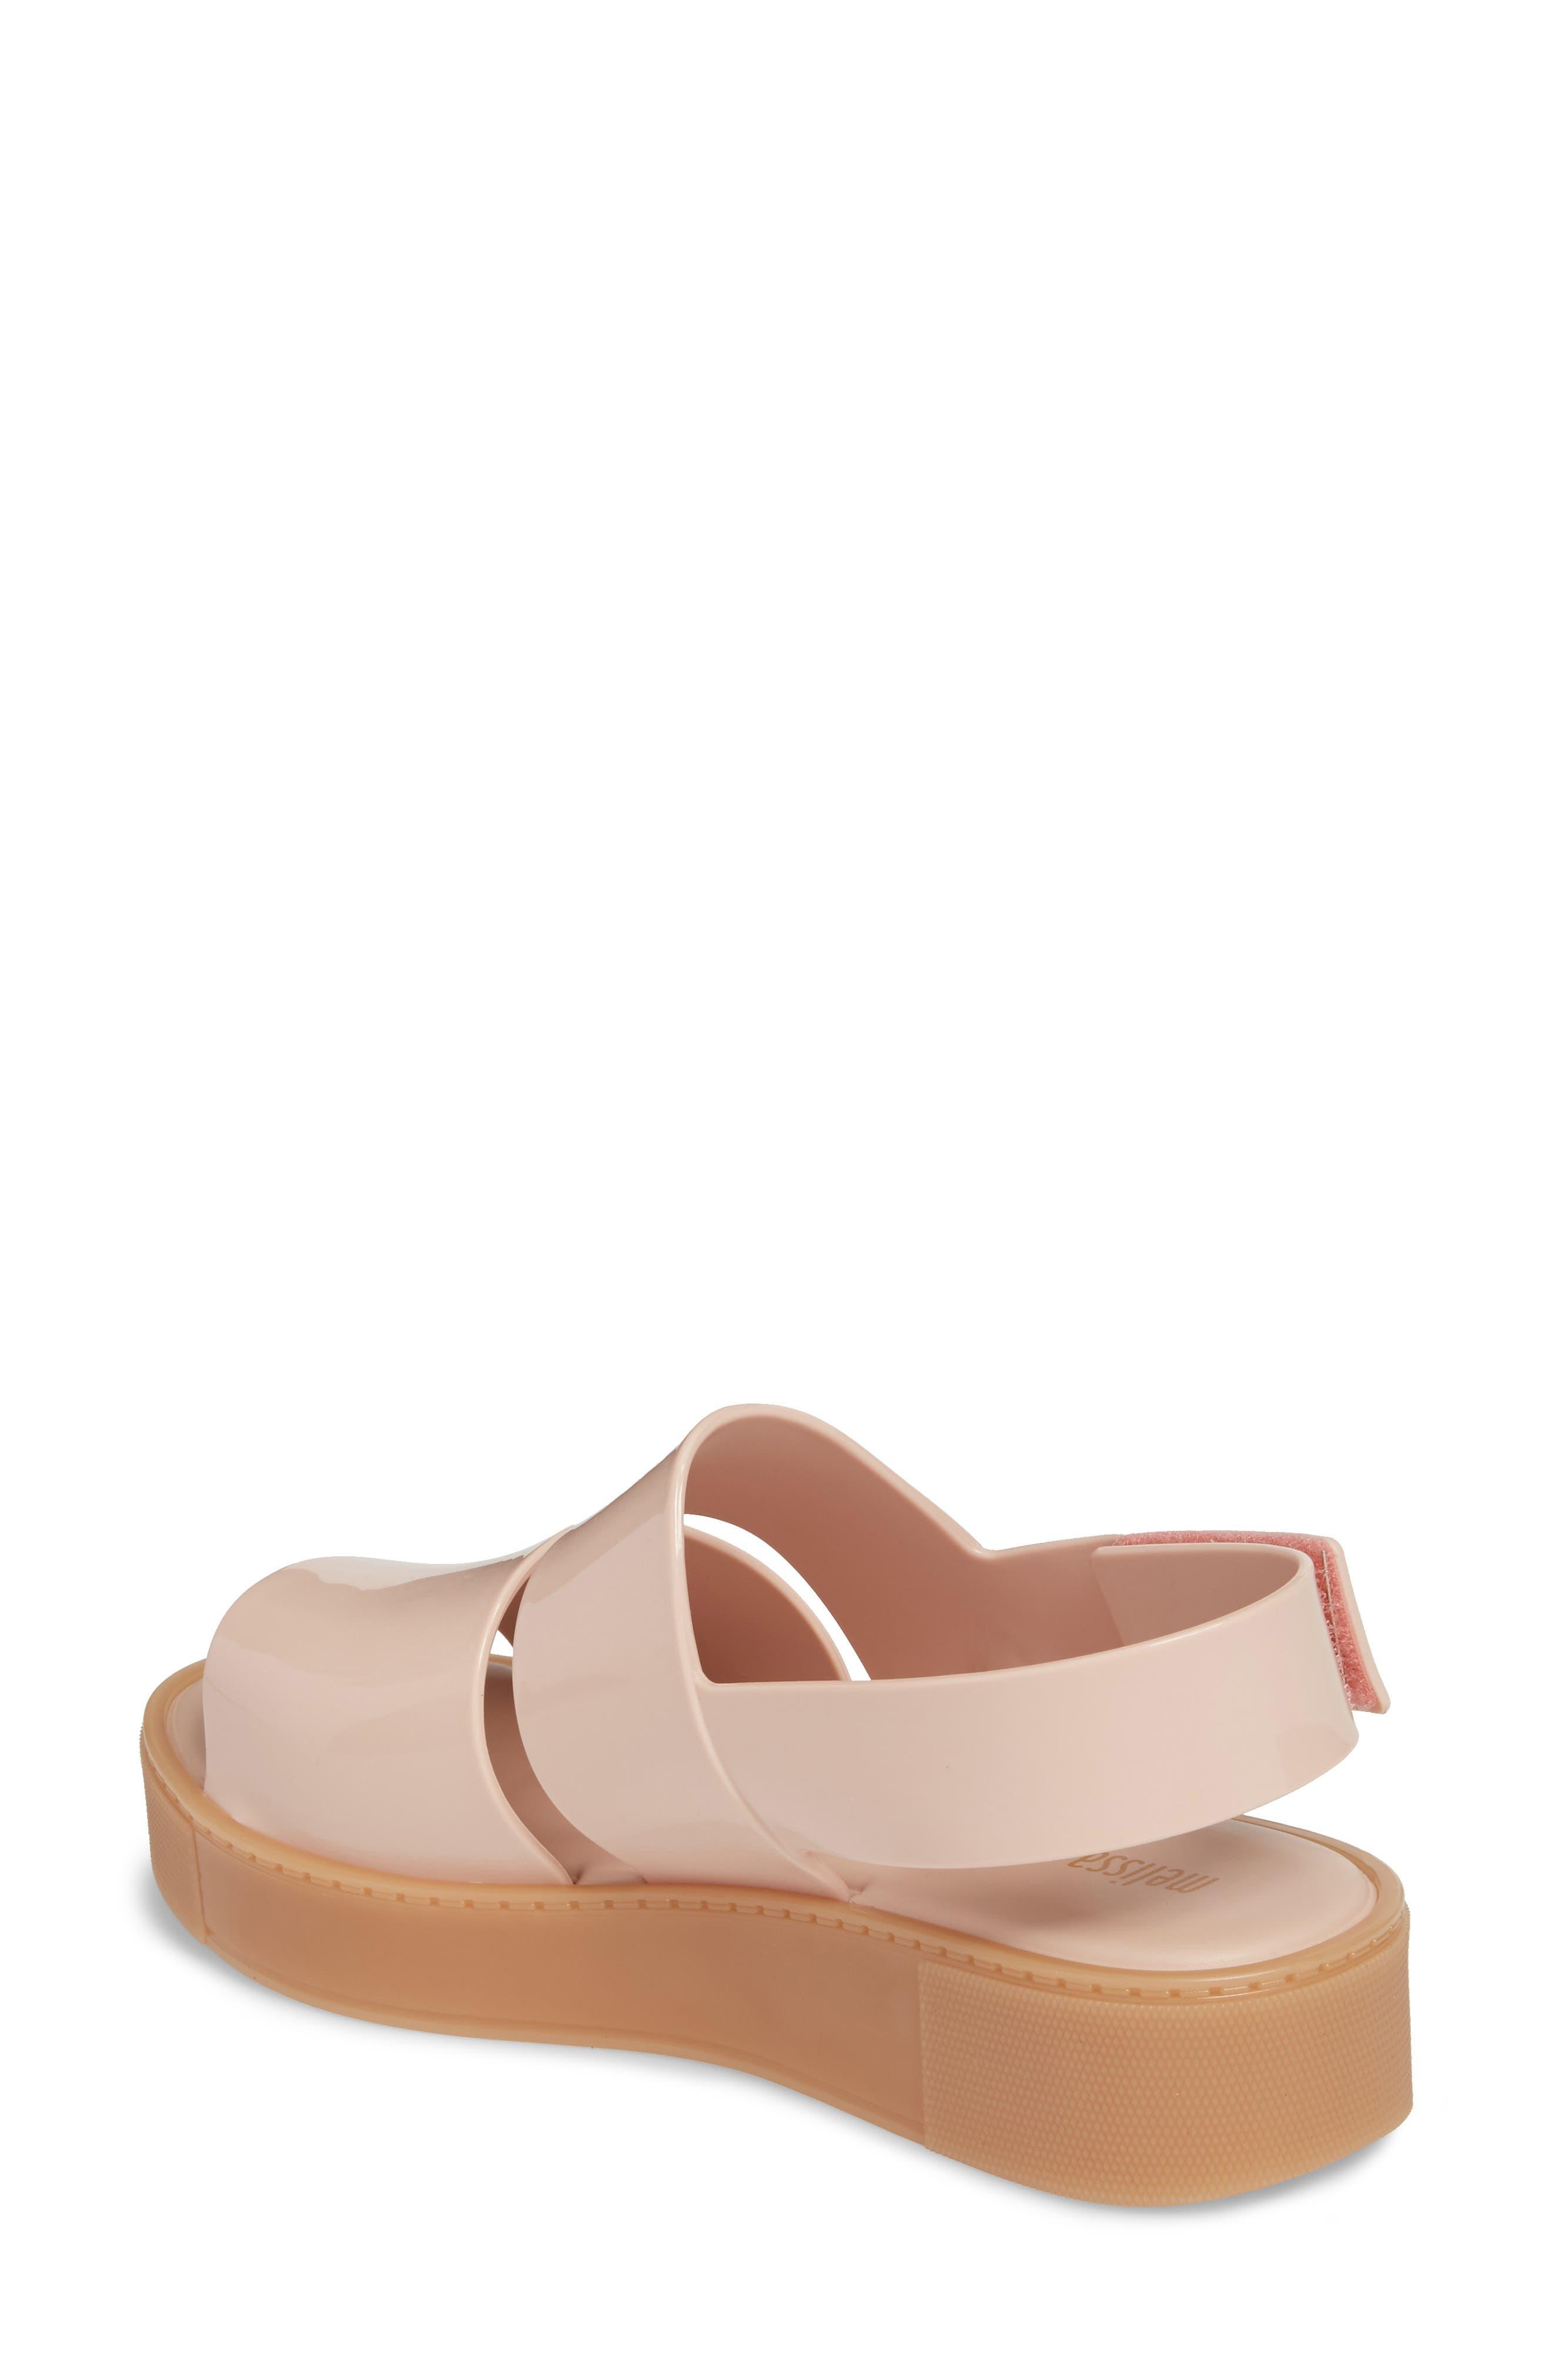 Soho Platform Sandal,                             Alternate thumbnail 4, color,